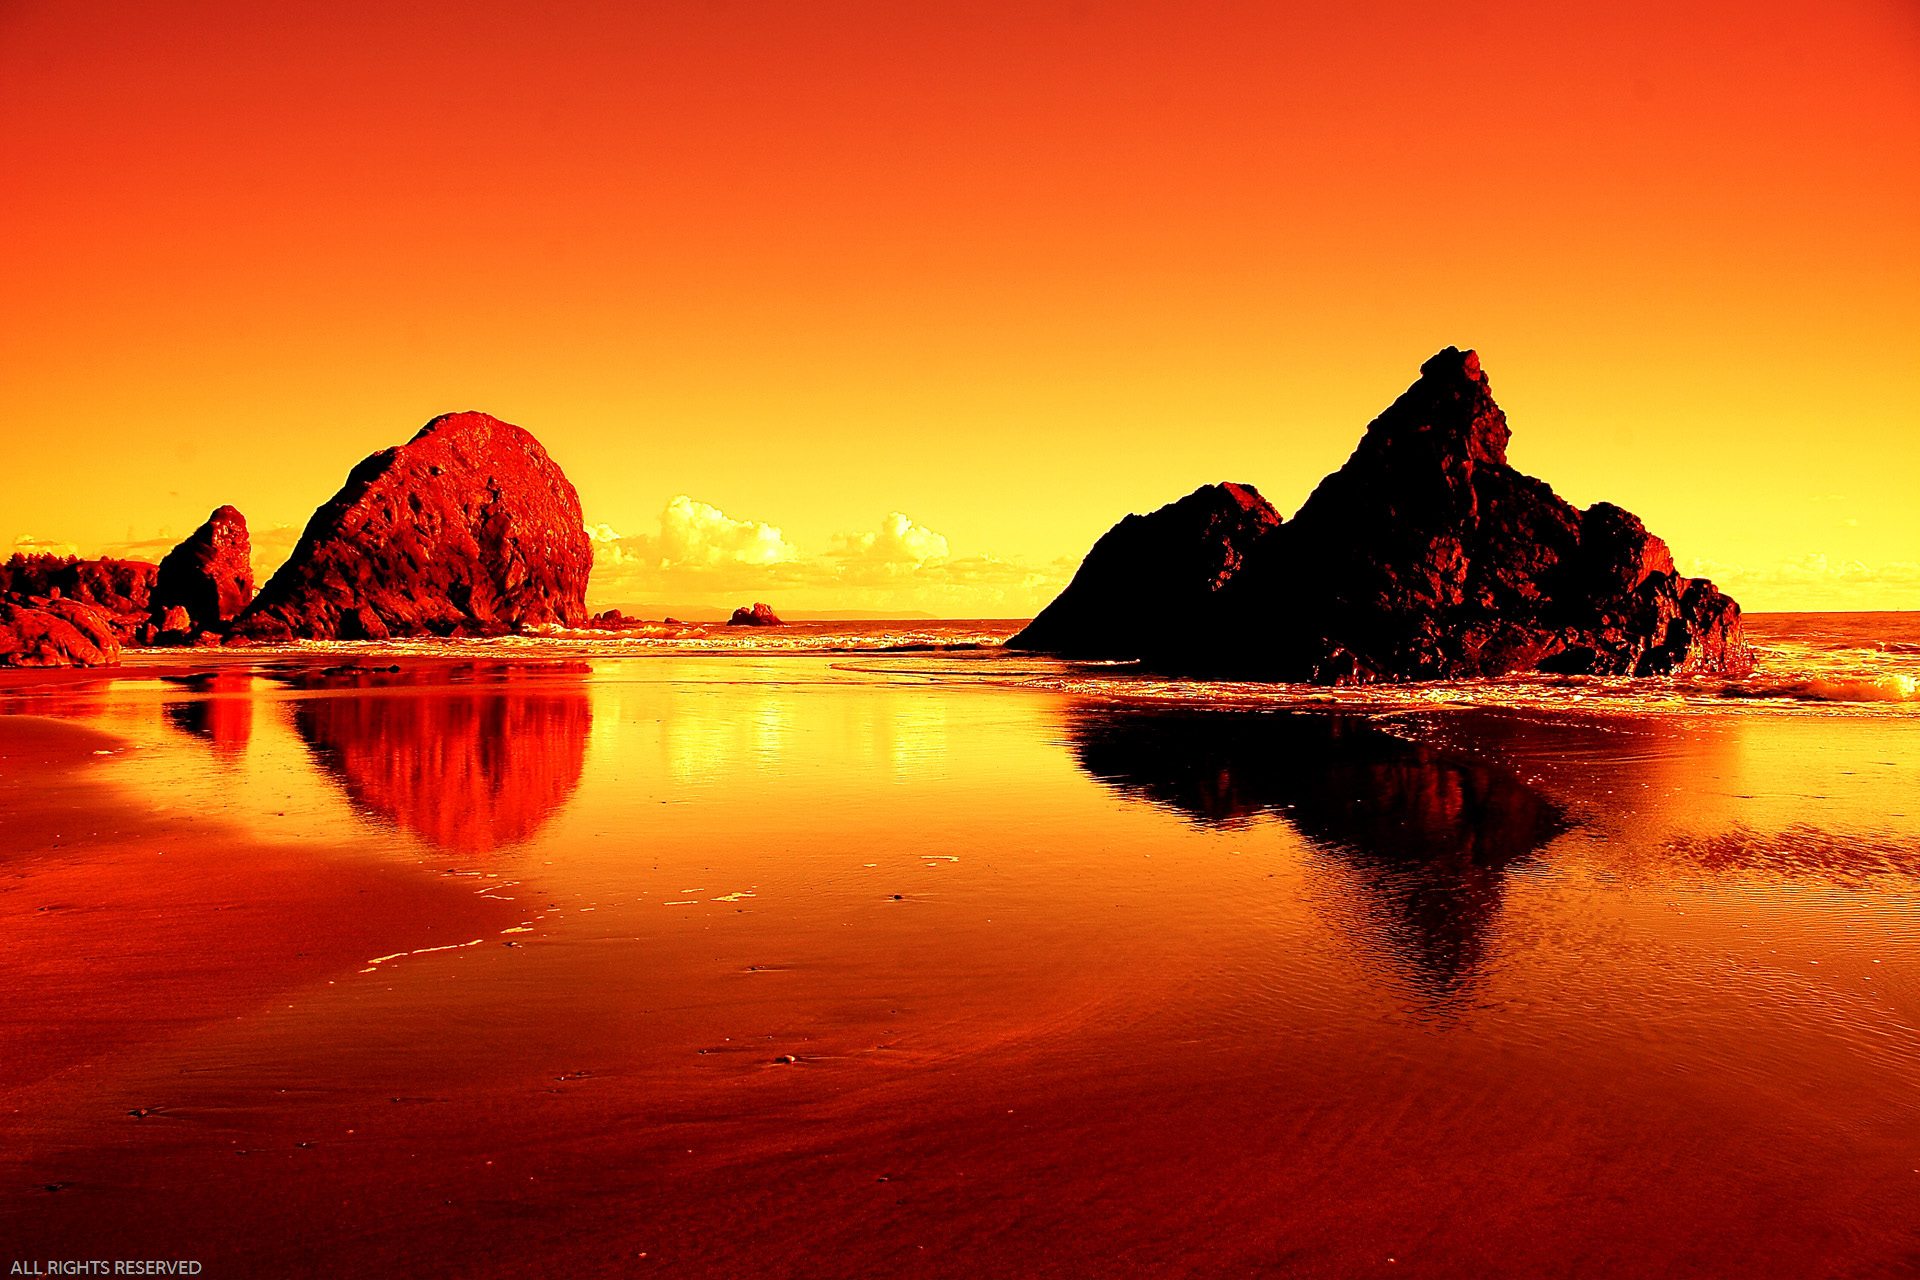 Sfondi desktop paesaggi hd tramonto rosso sfondi hd gratis for Foto full hd per desktop